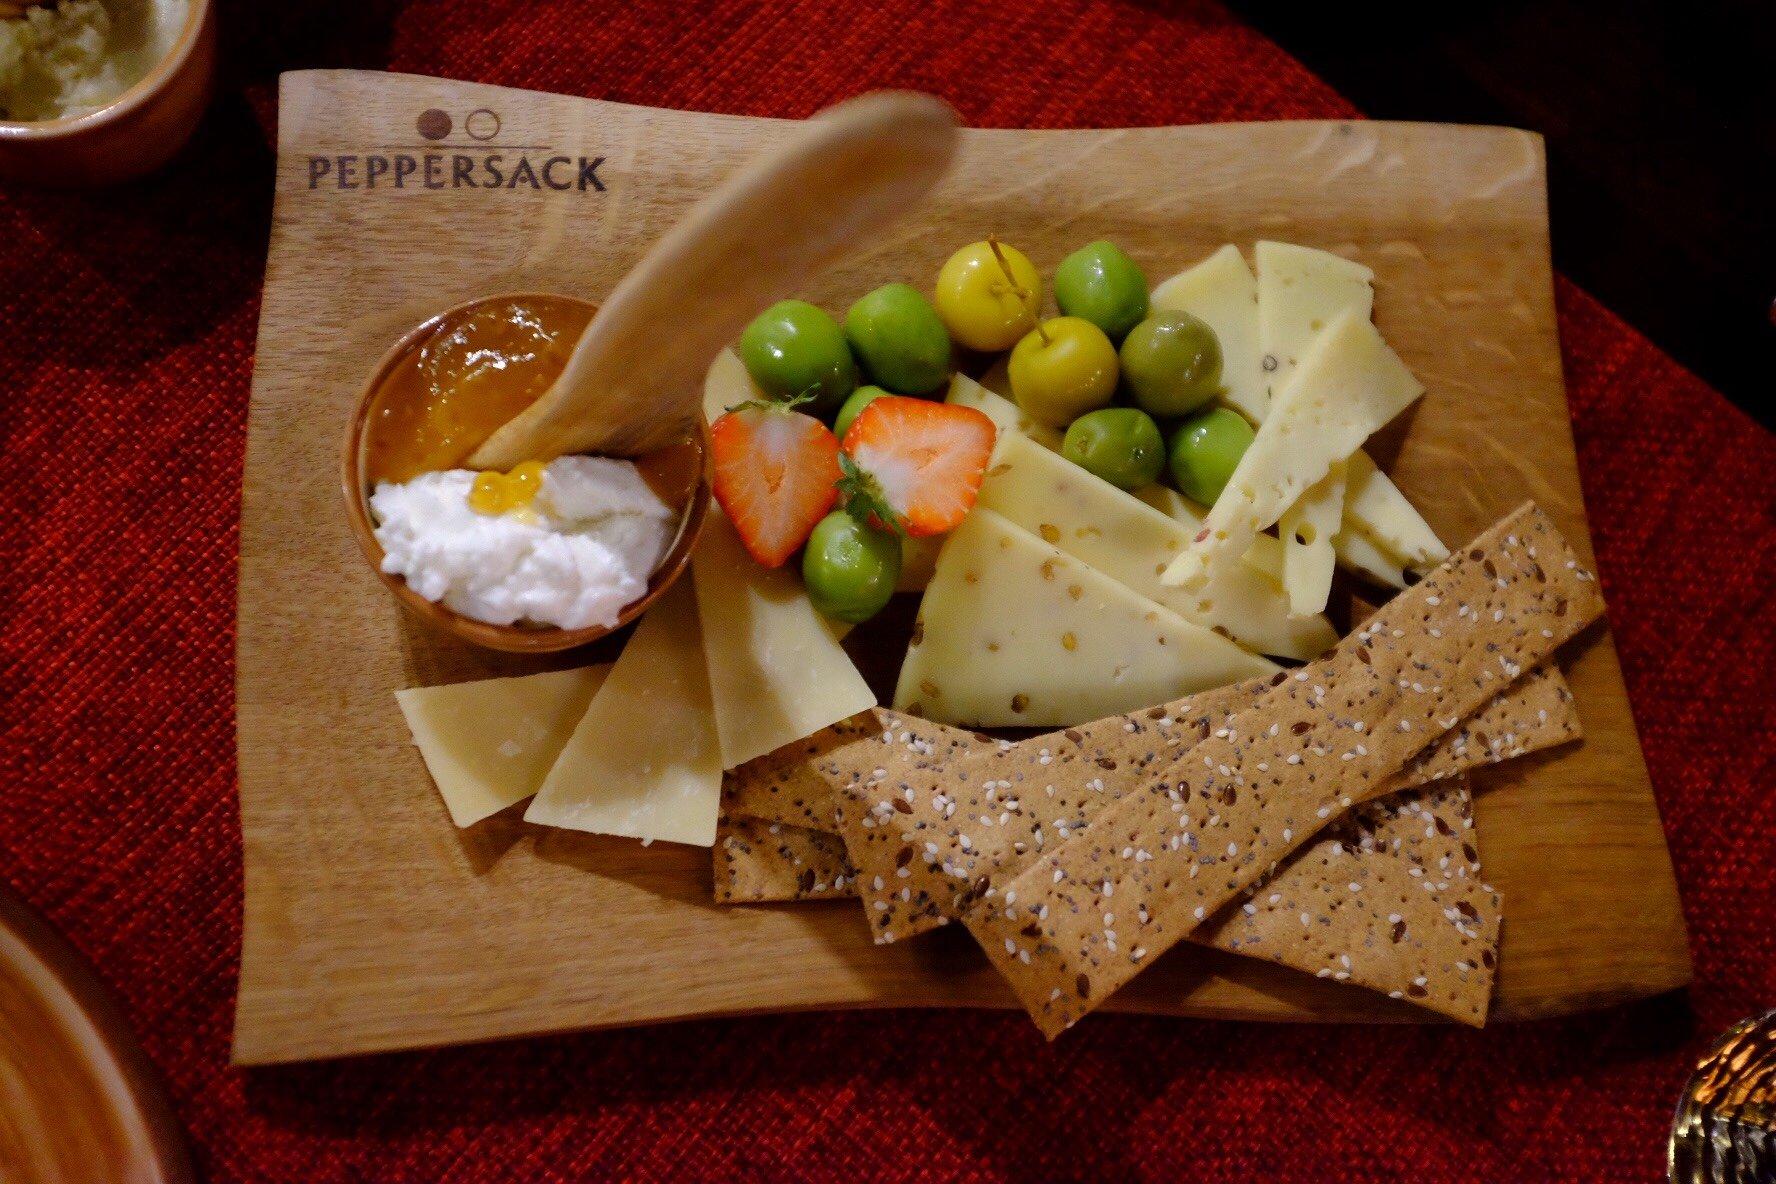 Yummie cheesplate we ate at the Peppersack in Tallinn